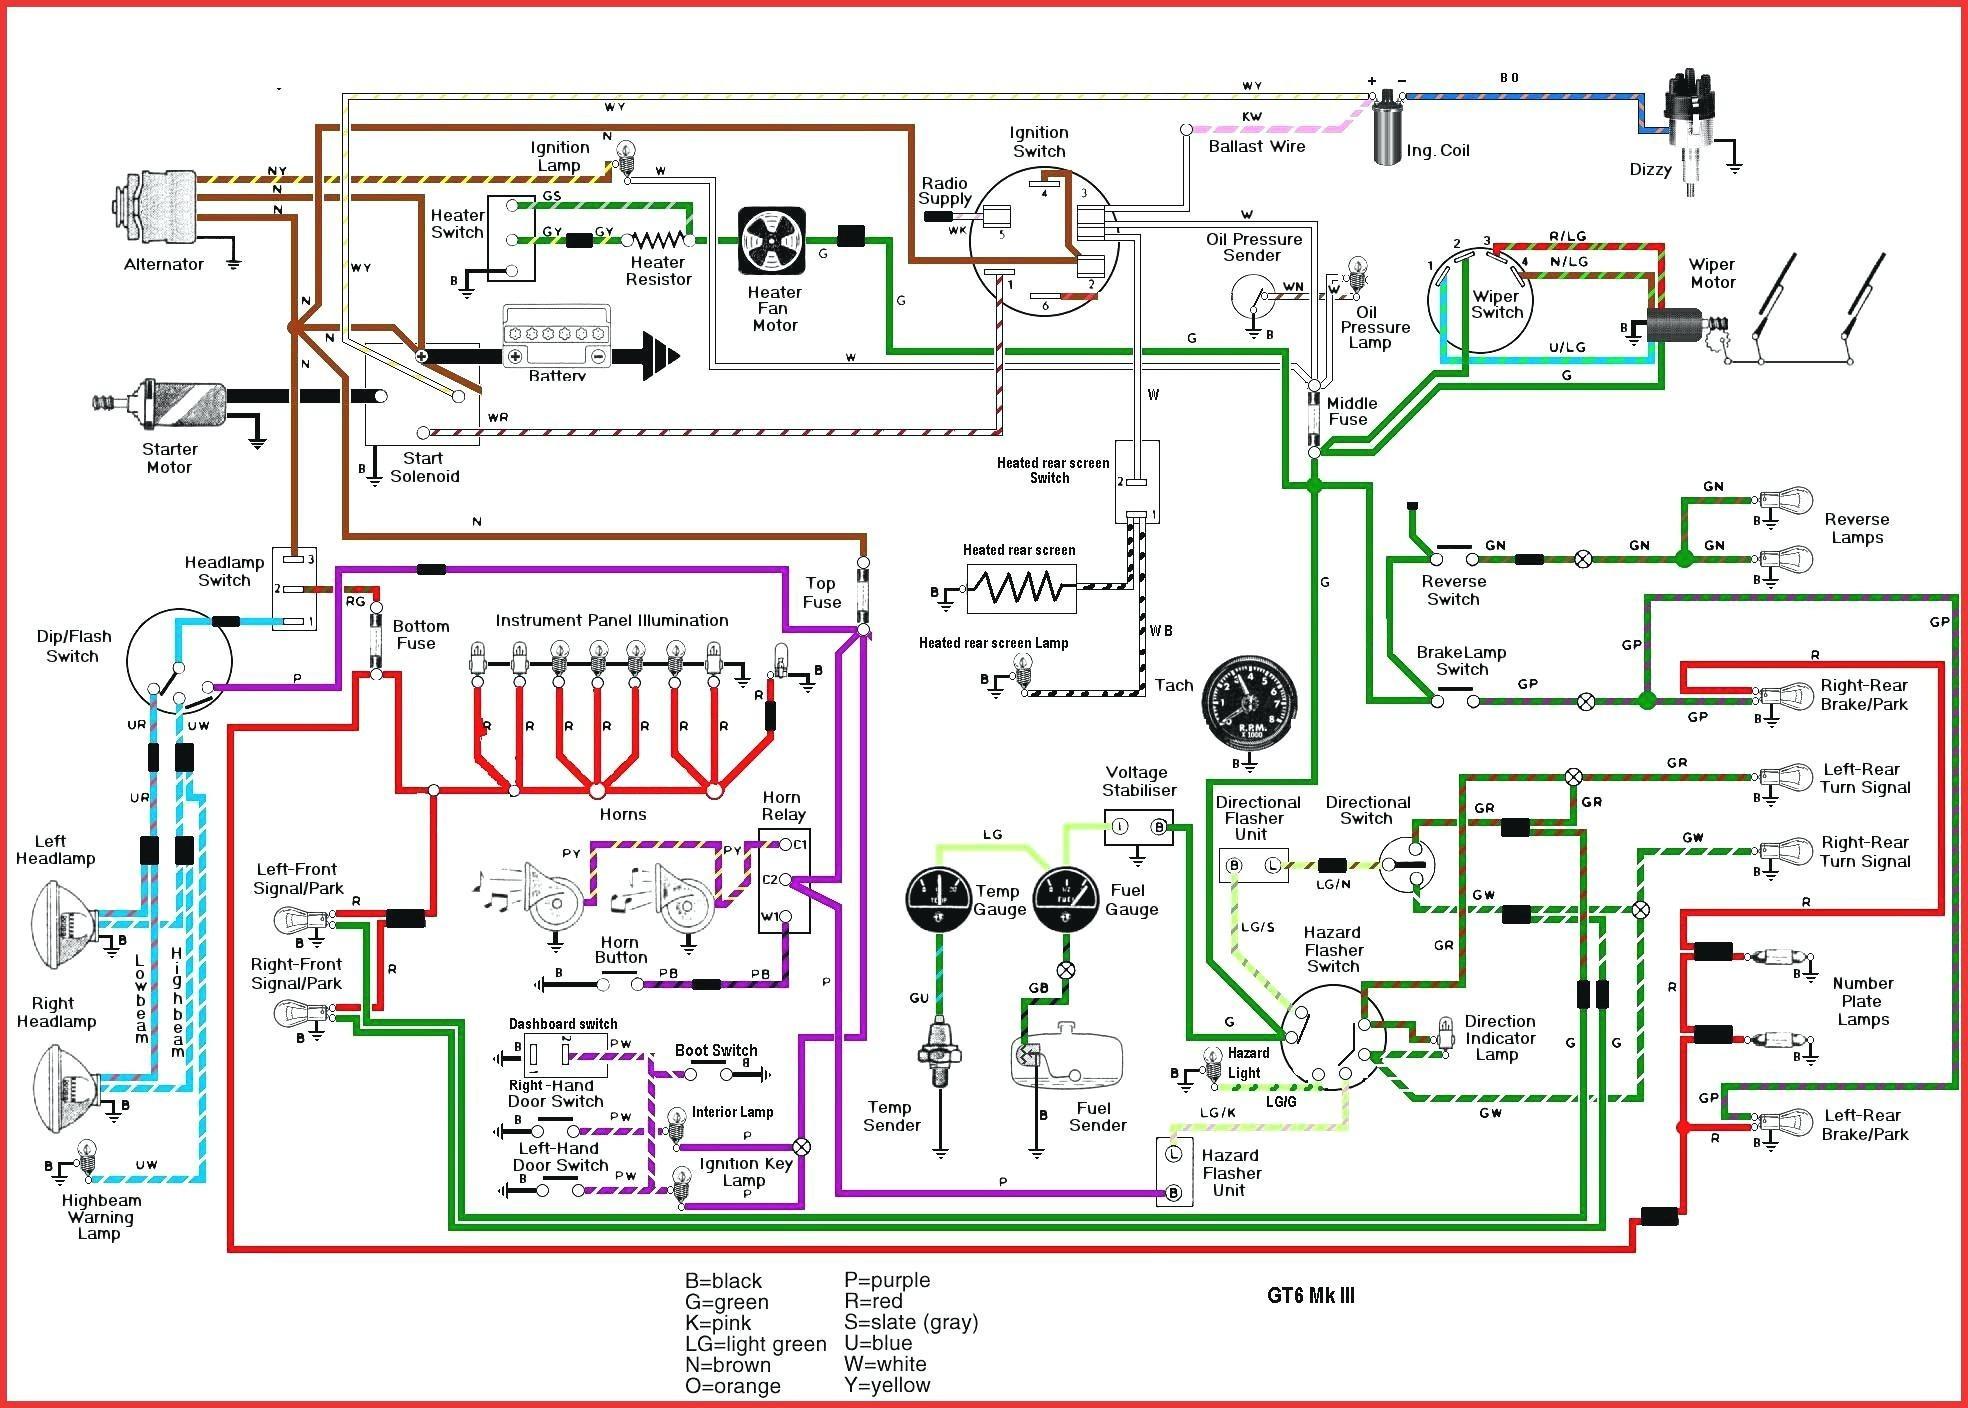 delorean wiring diagrams gm 4942  legends race car wiring diagram wiring diagram wiring diagram  legends race car wiring diagram wiring